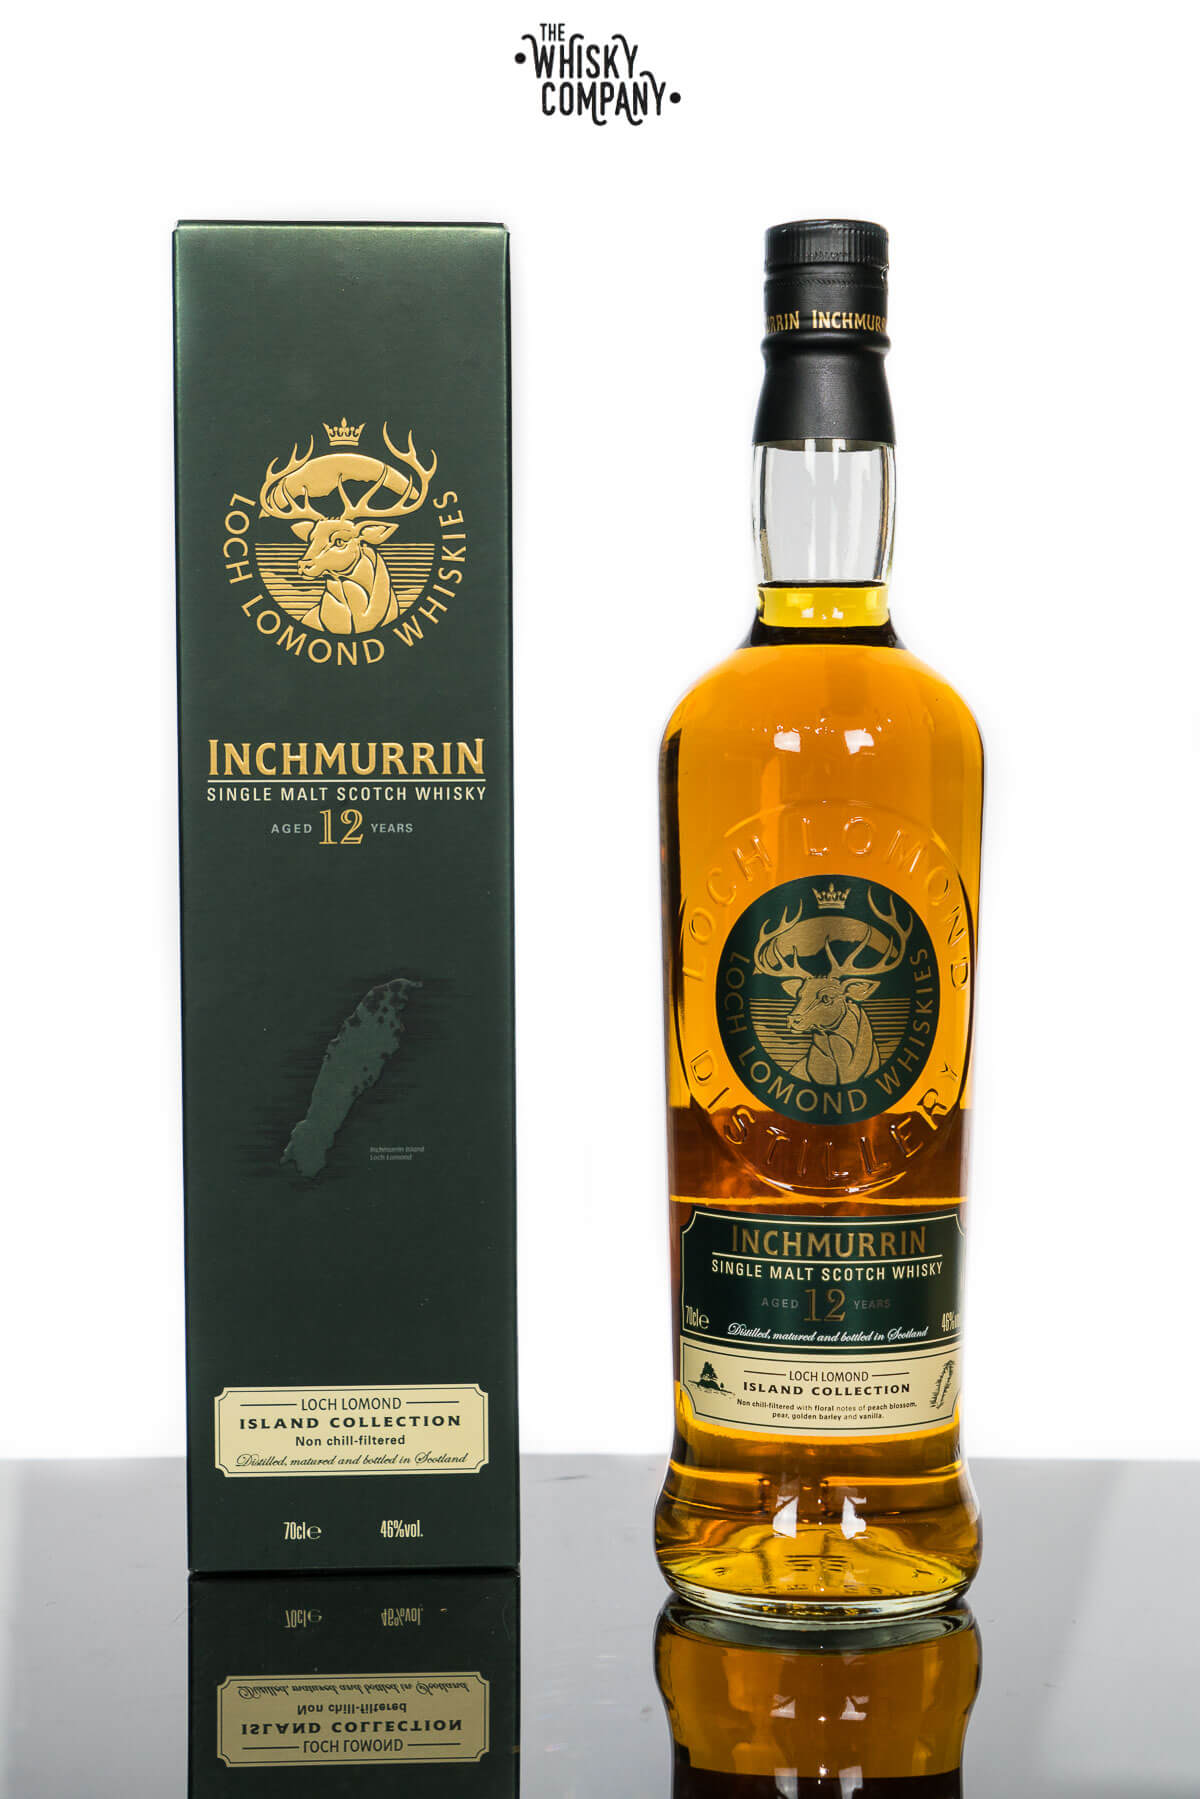 Inchmurrin Aged 12 Years Highland Single Malt Scotch Whisky (700ml)